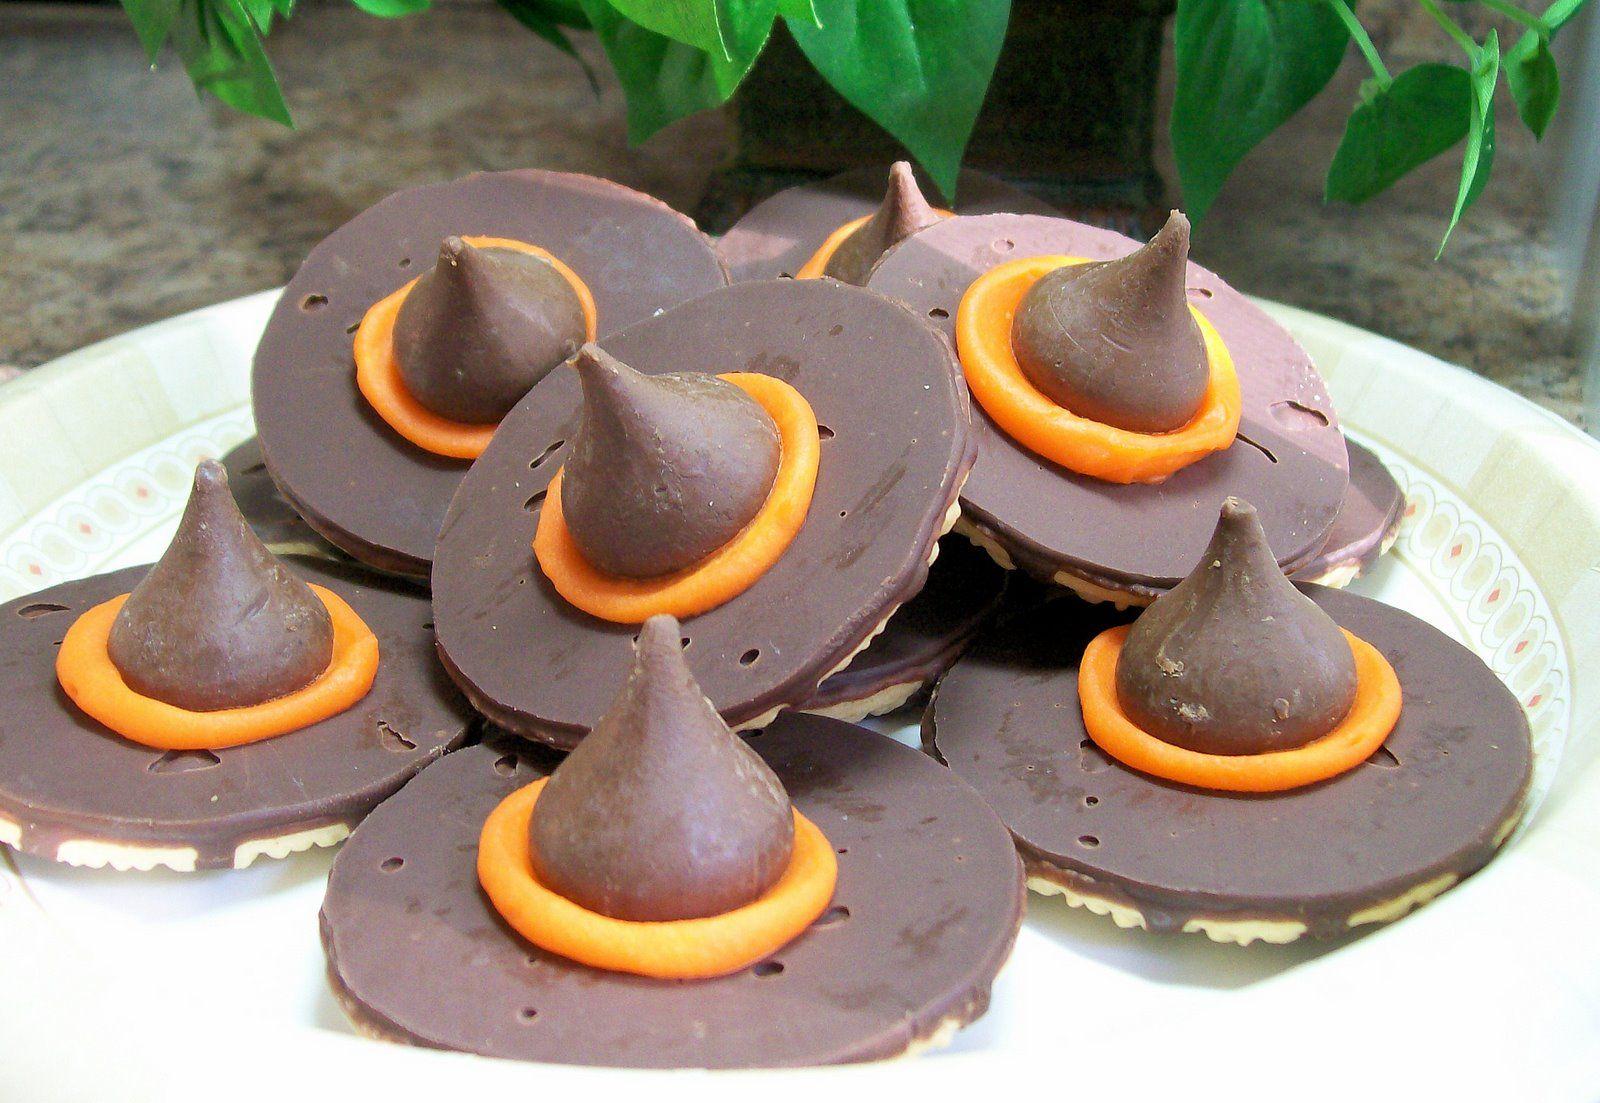 Halloween treats | Party foods holidays,birthdays,fun ...